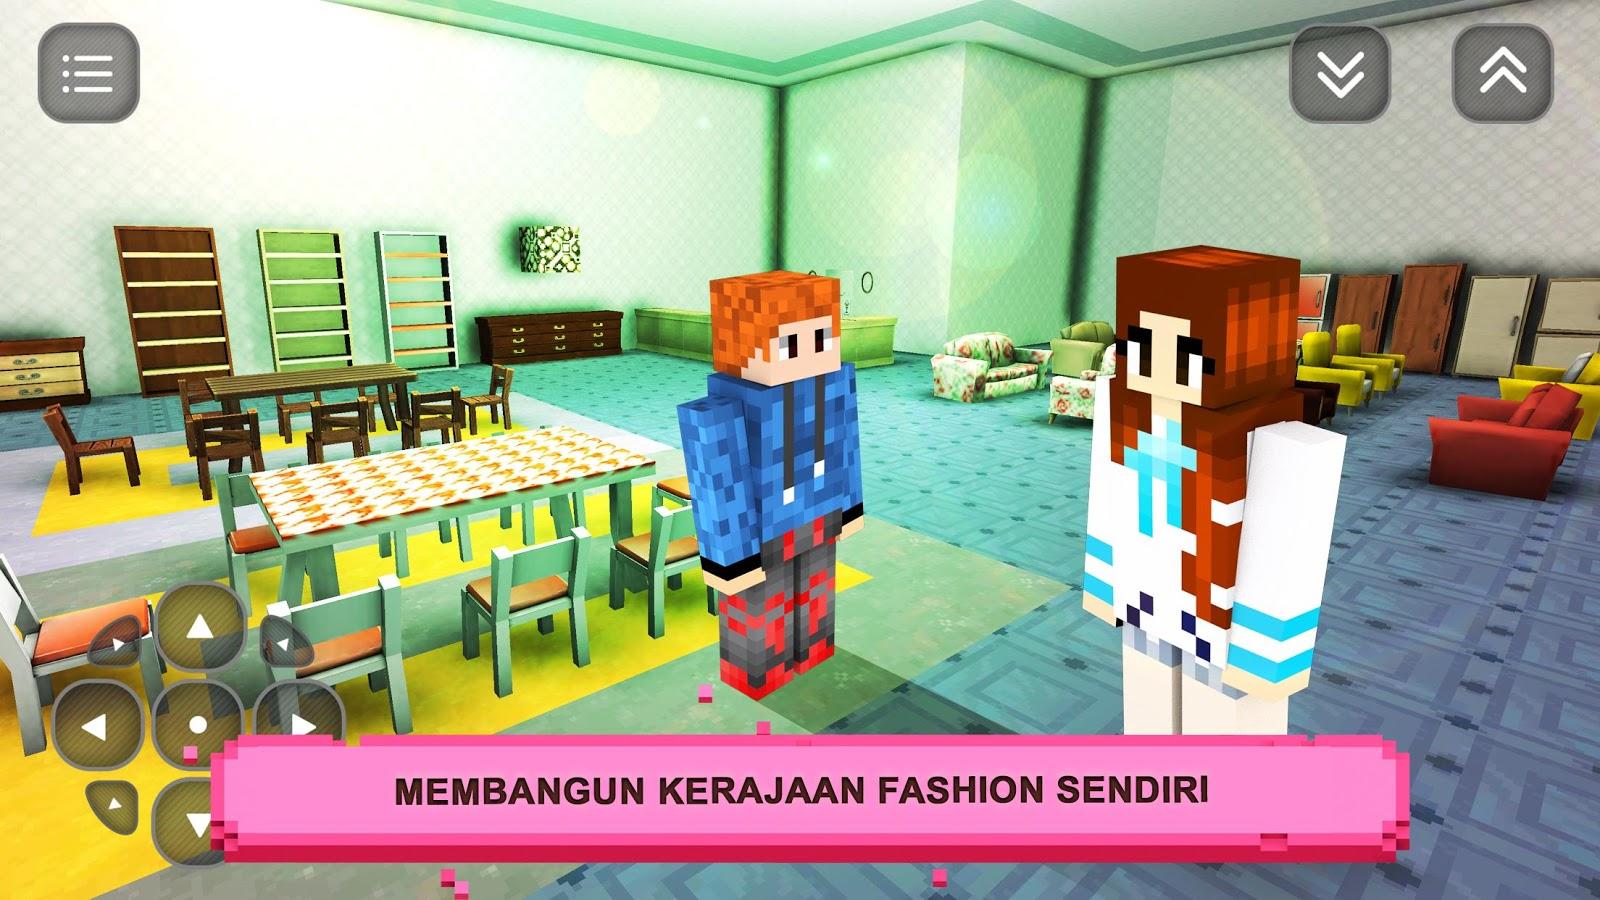 Desain Fashion Anak Perempuan Apl Android Di Google Play